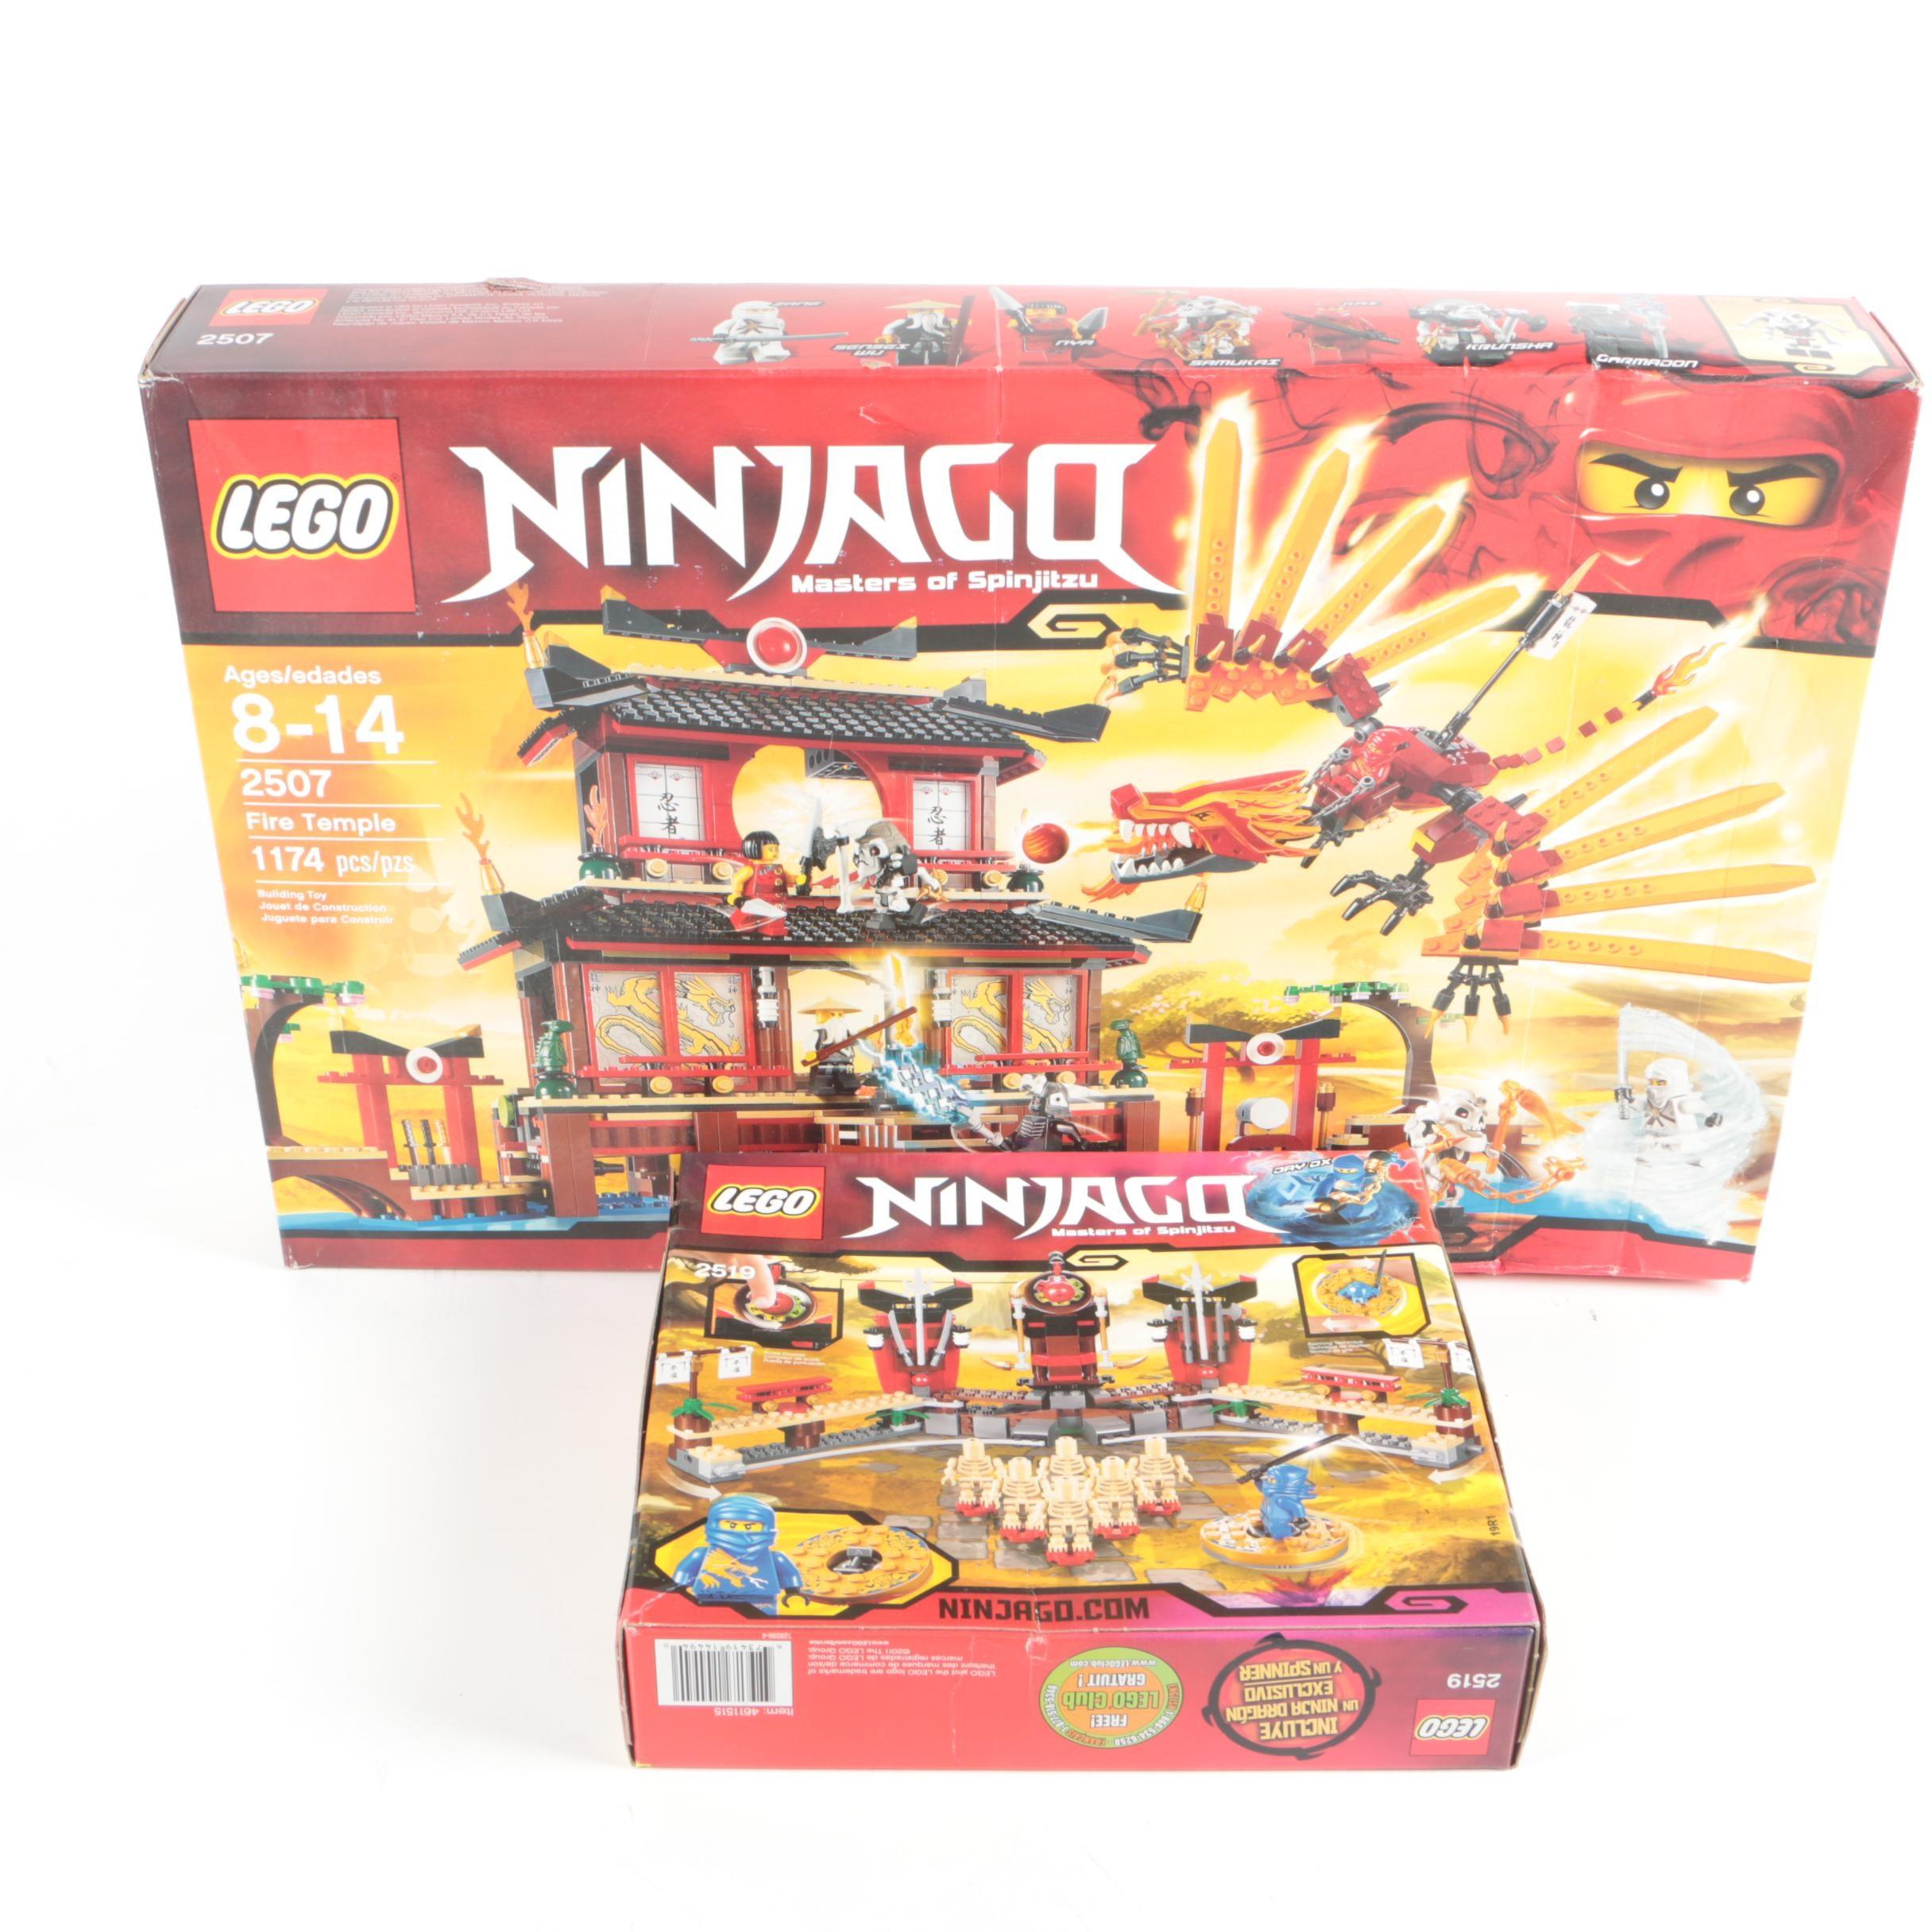 "Lego ""Ninjago"" Fire Temple and Character Sets"